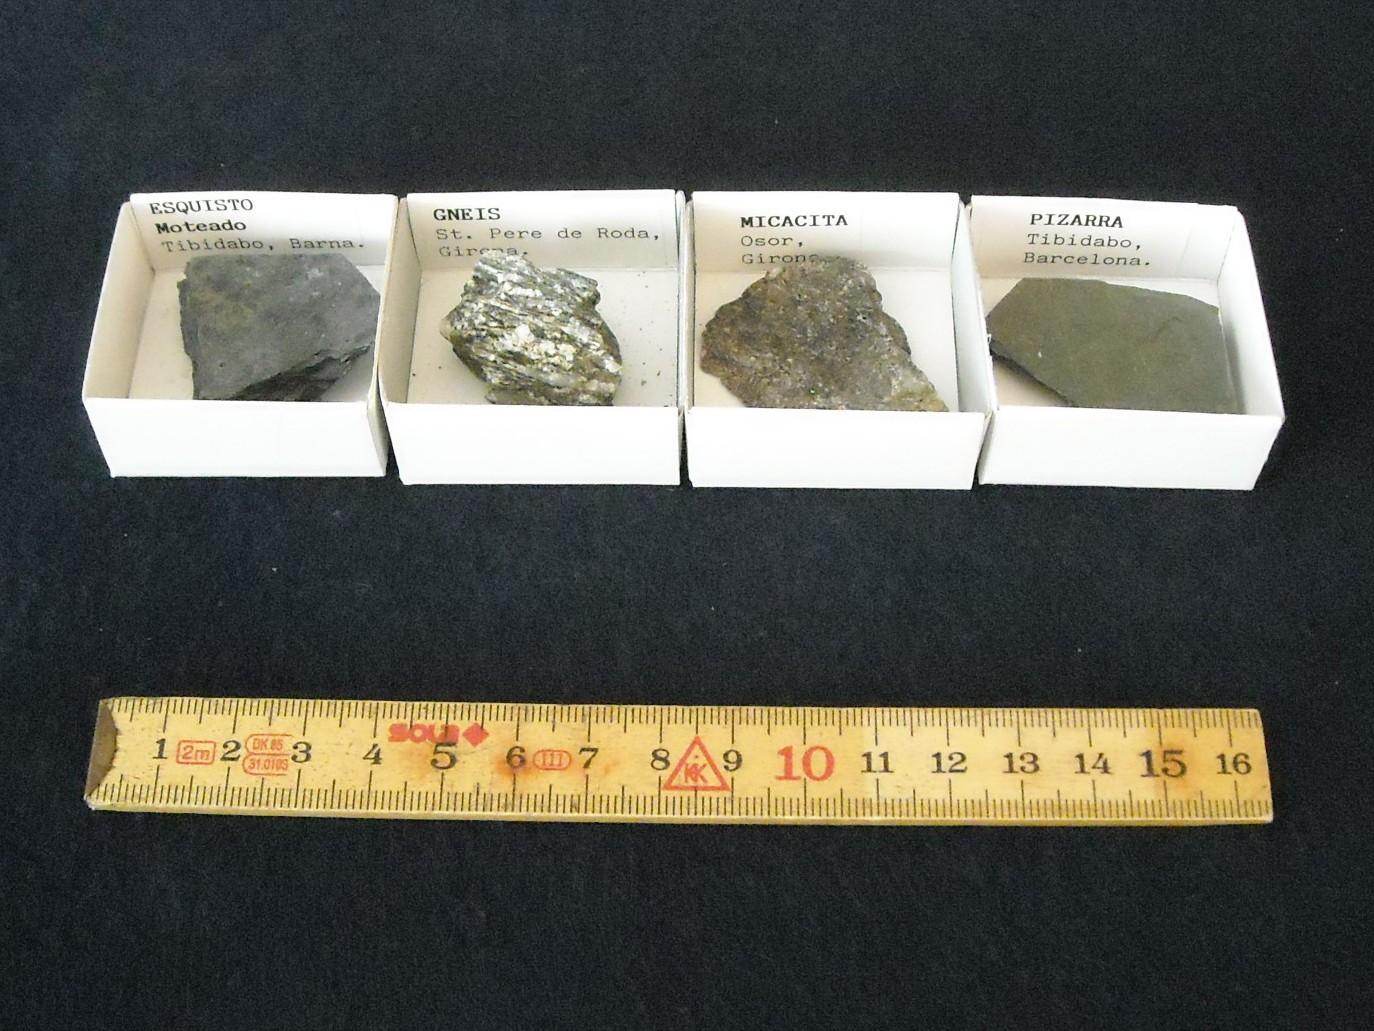 Humbert sanz colecci n de rocas tipolog as y clasificaci n for Marmol clasificacion